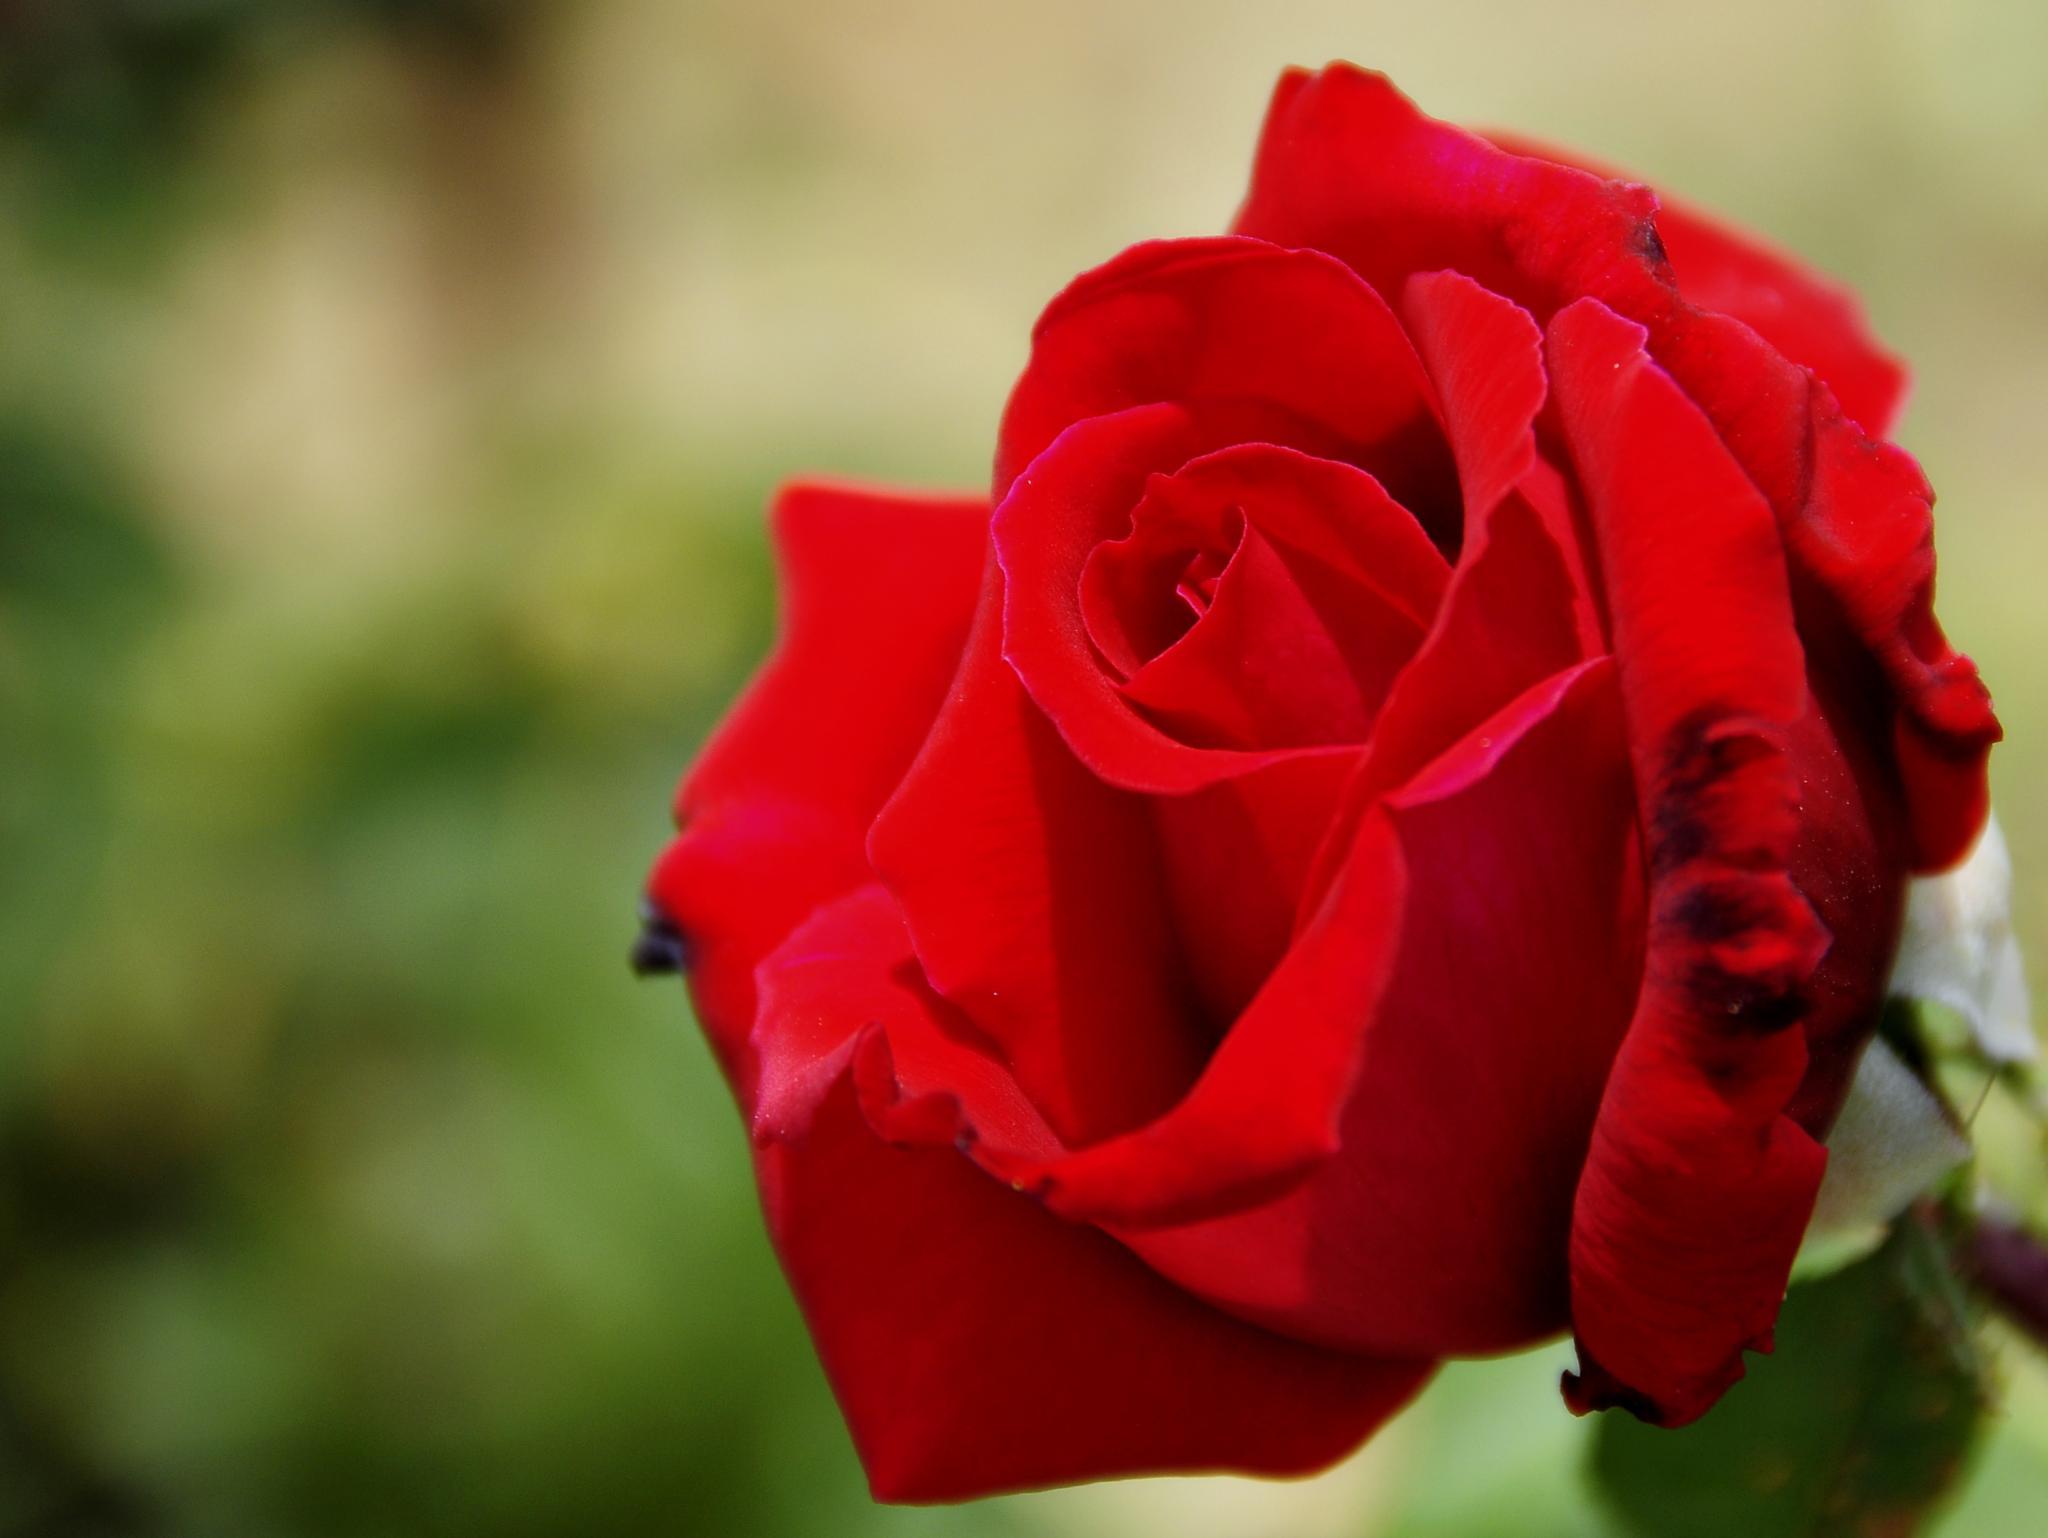 rojo by angelgarcia